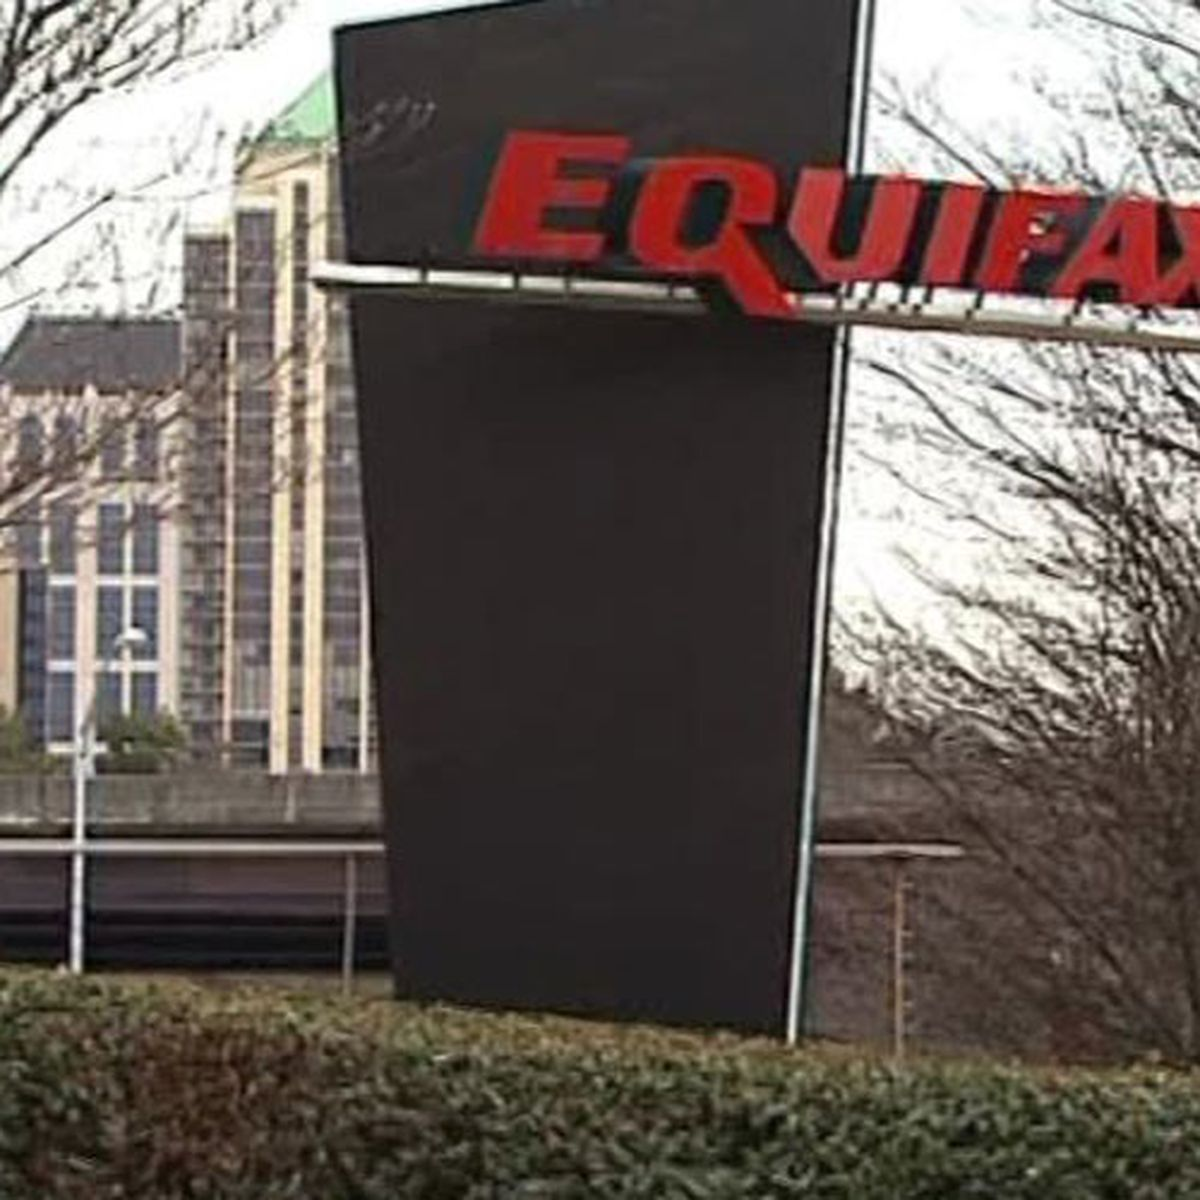 Equifax: How do you get settlement money?